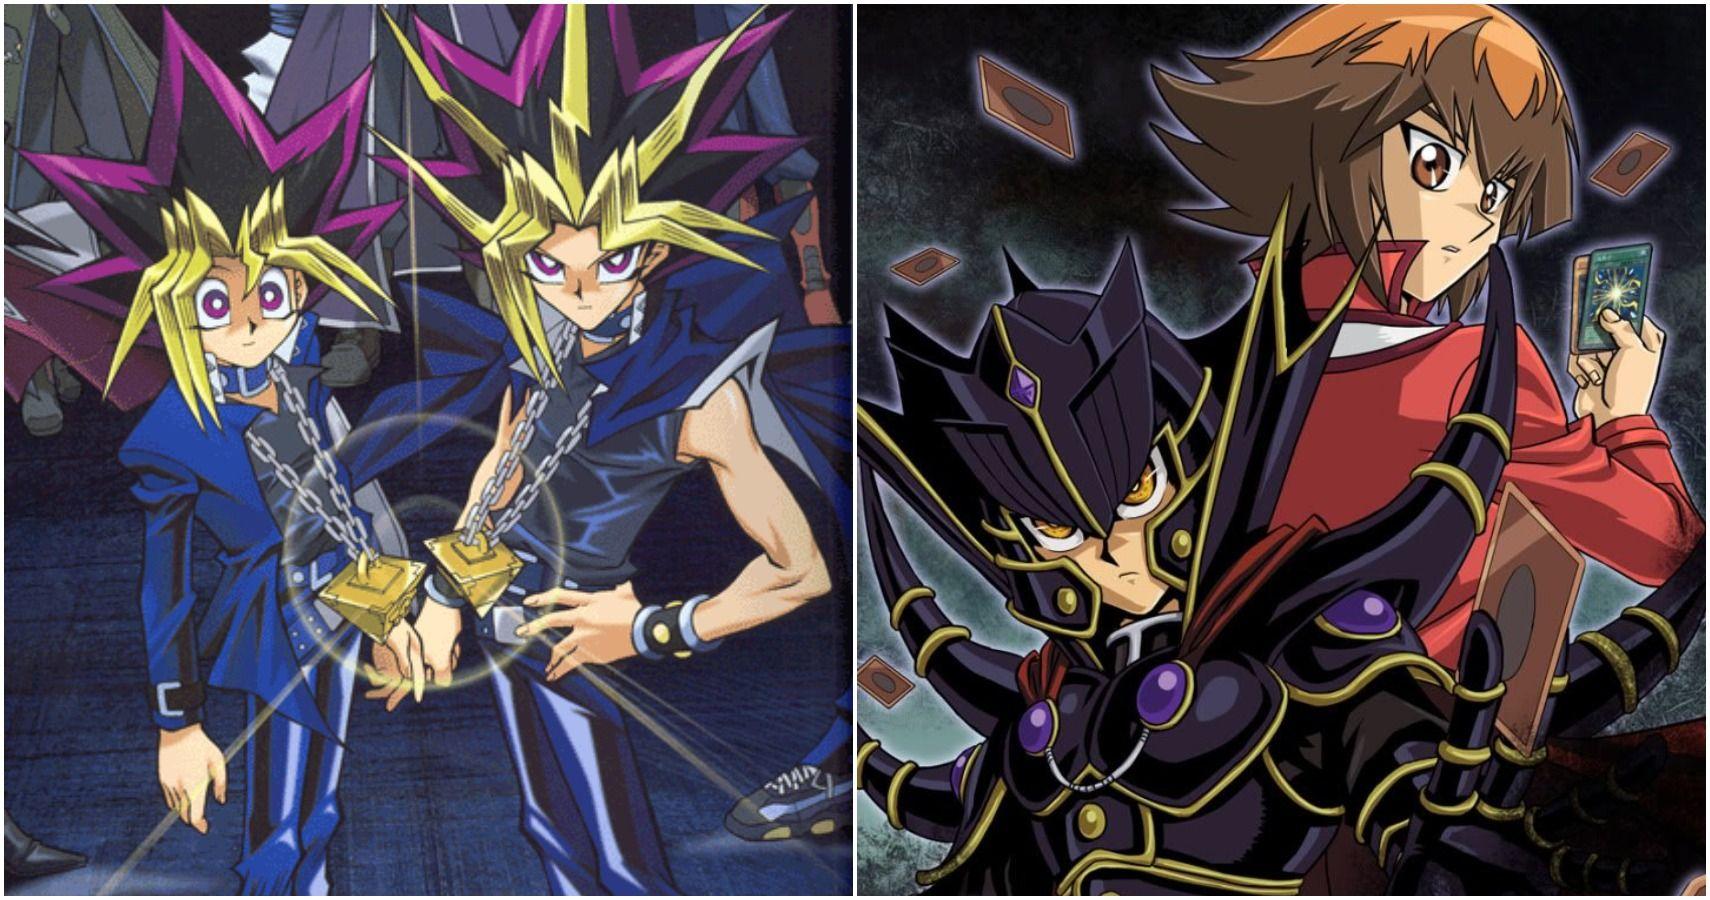 Yu-Gi-Oh!: 5 Reasons Why Yugi Is The Best Protagonist (& 5 Why It's Jaden)